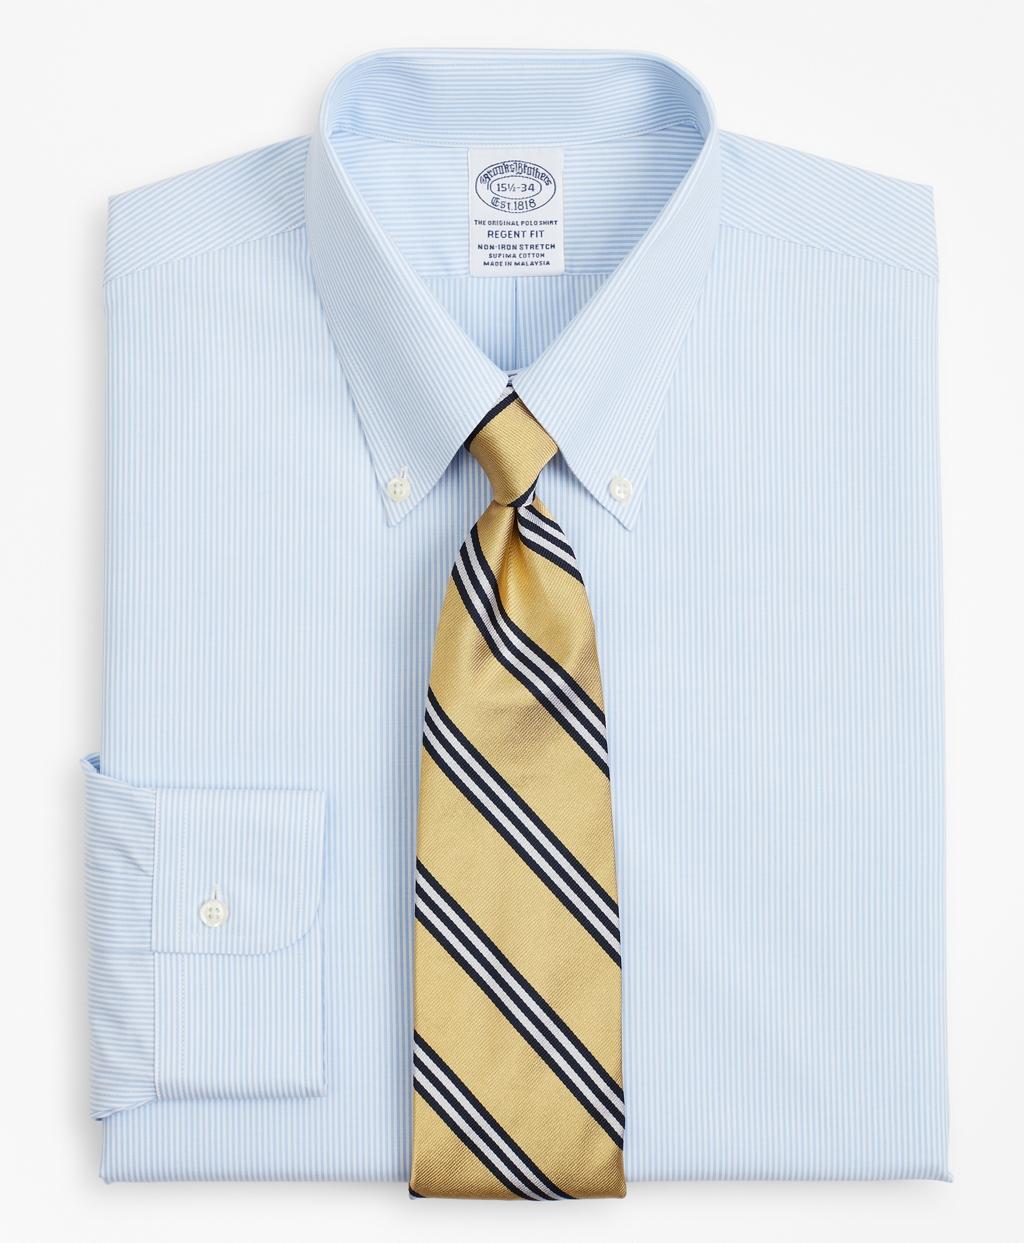 Brooksbrothers Stretch Regent Regular-Fit Dress Shirt, Non-Iron Poplin Button-Down Collar Fine Stripe